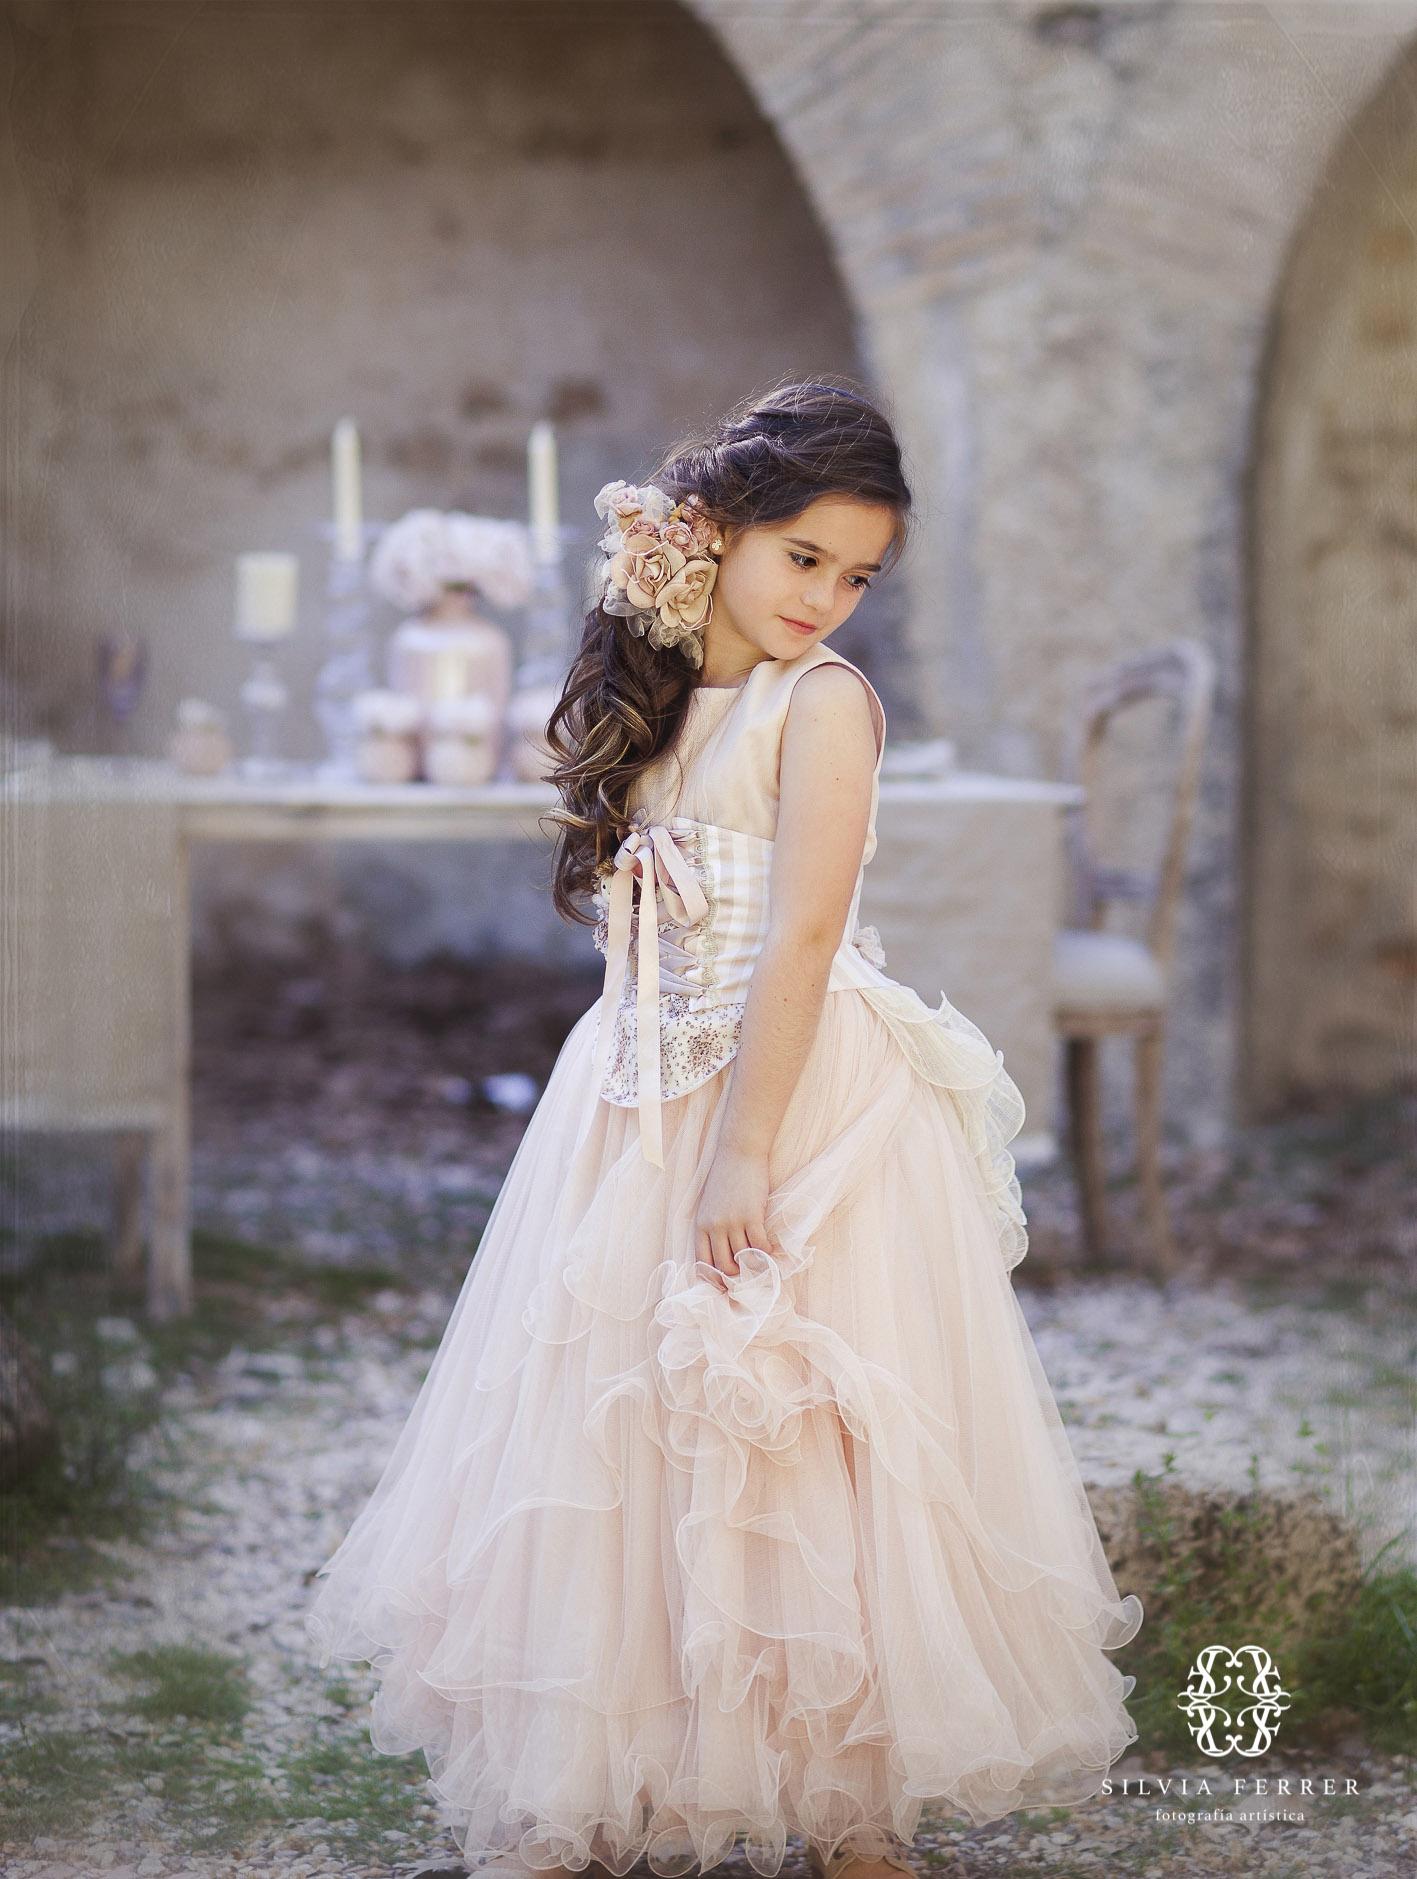 hortensia maeso en Murcia